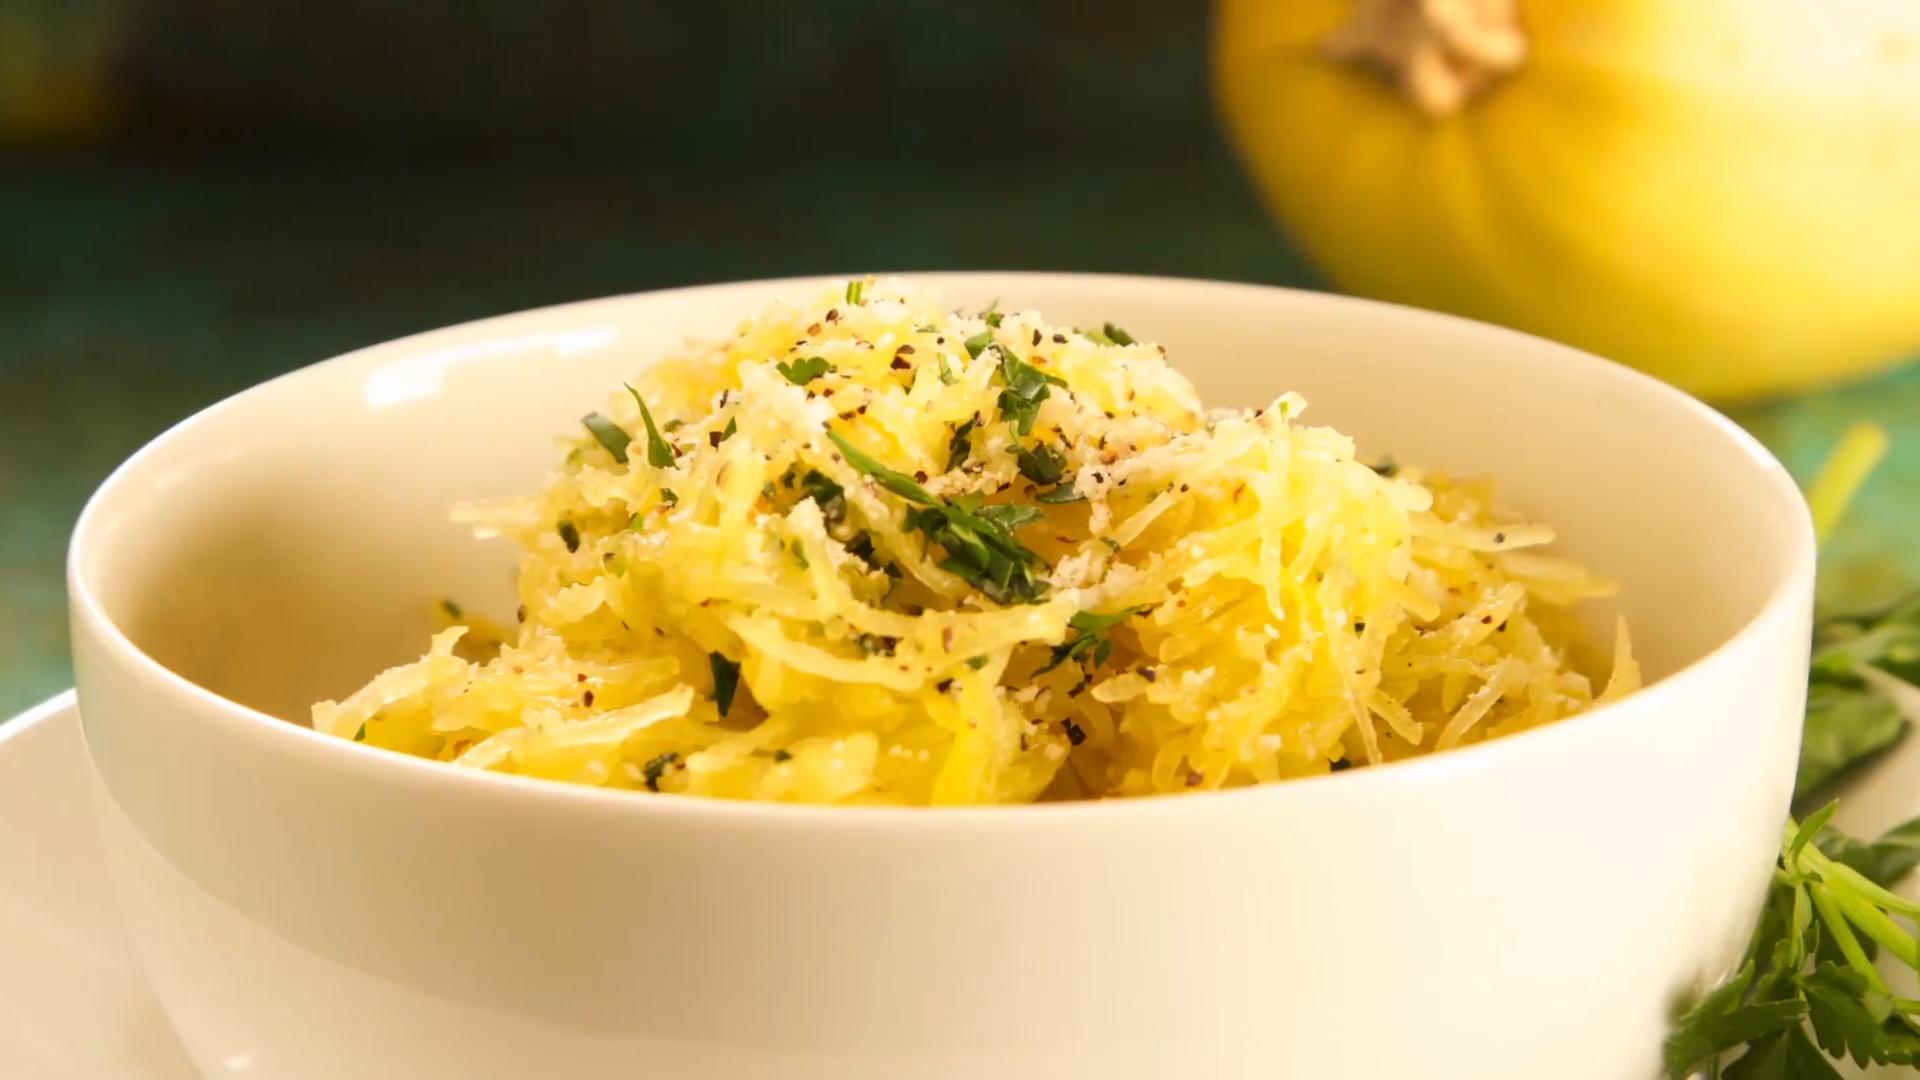 90 Second Garlic Herb Spaghetti Squash